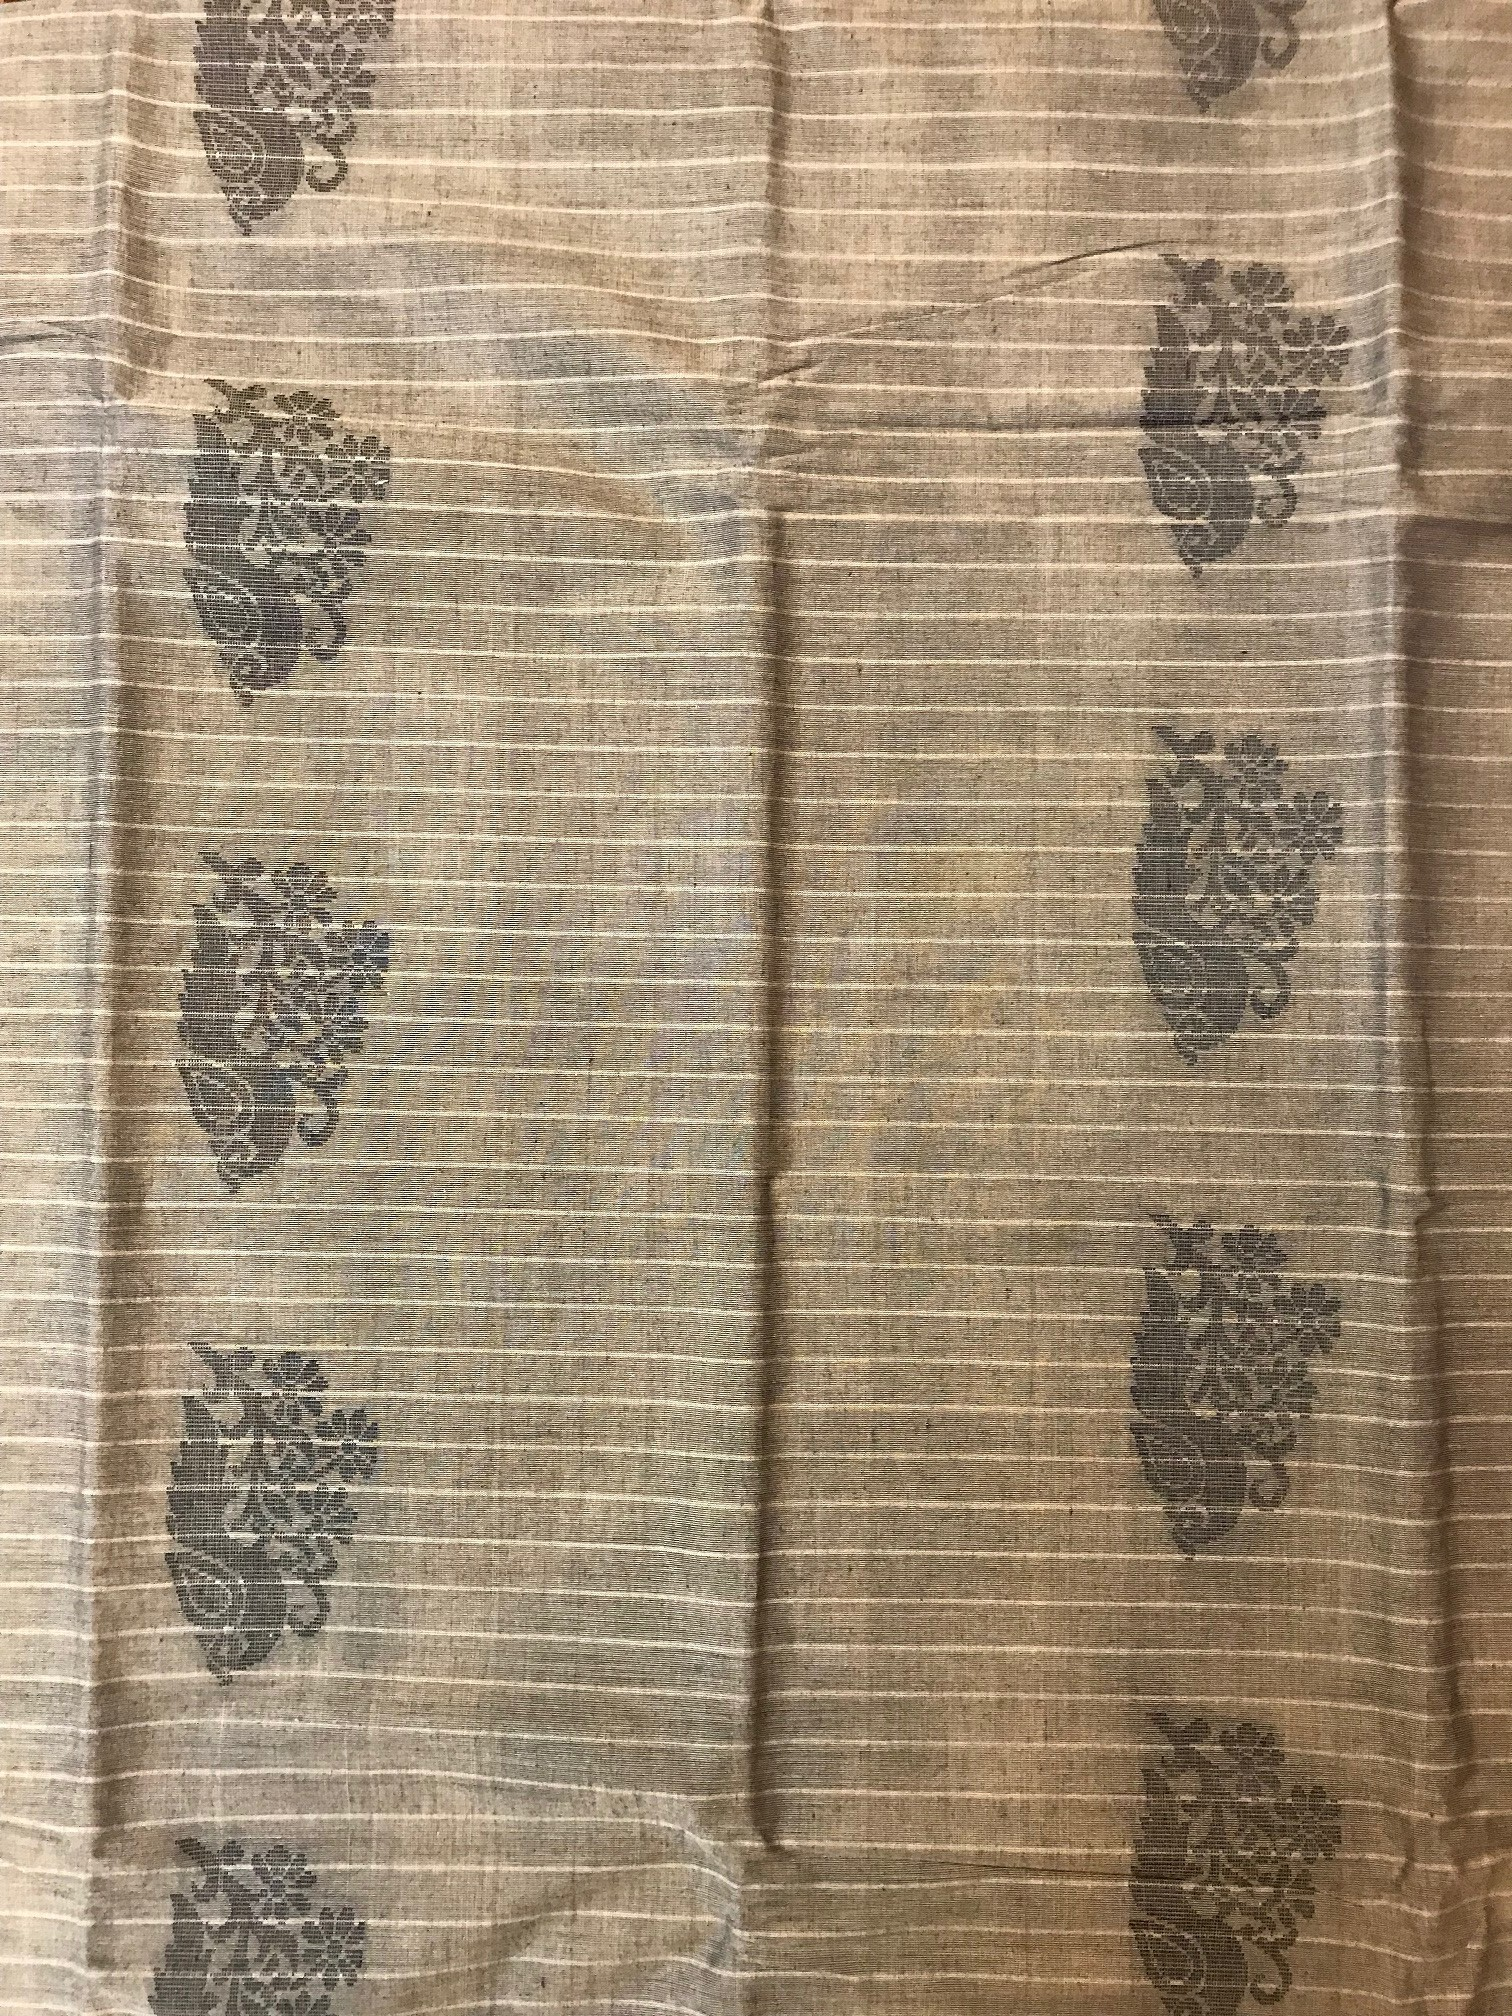 Taupe and Black Kanchi Cotton Saree (INDI-1001)